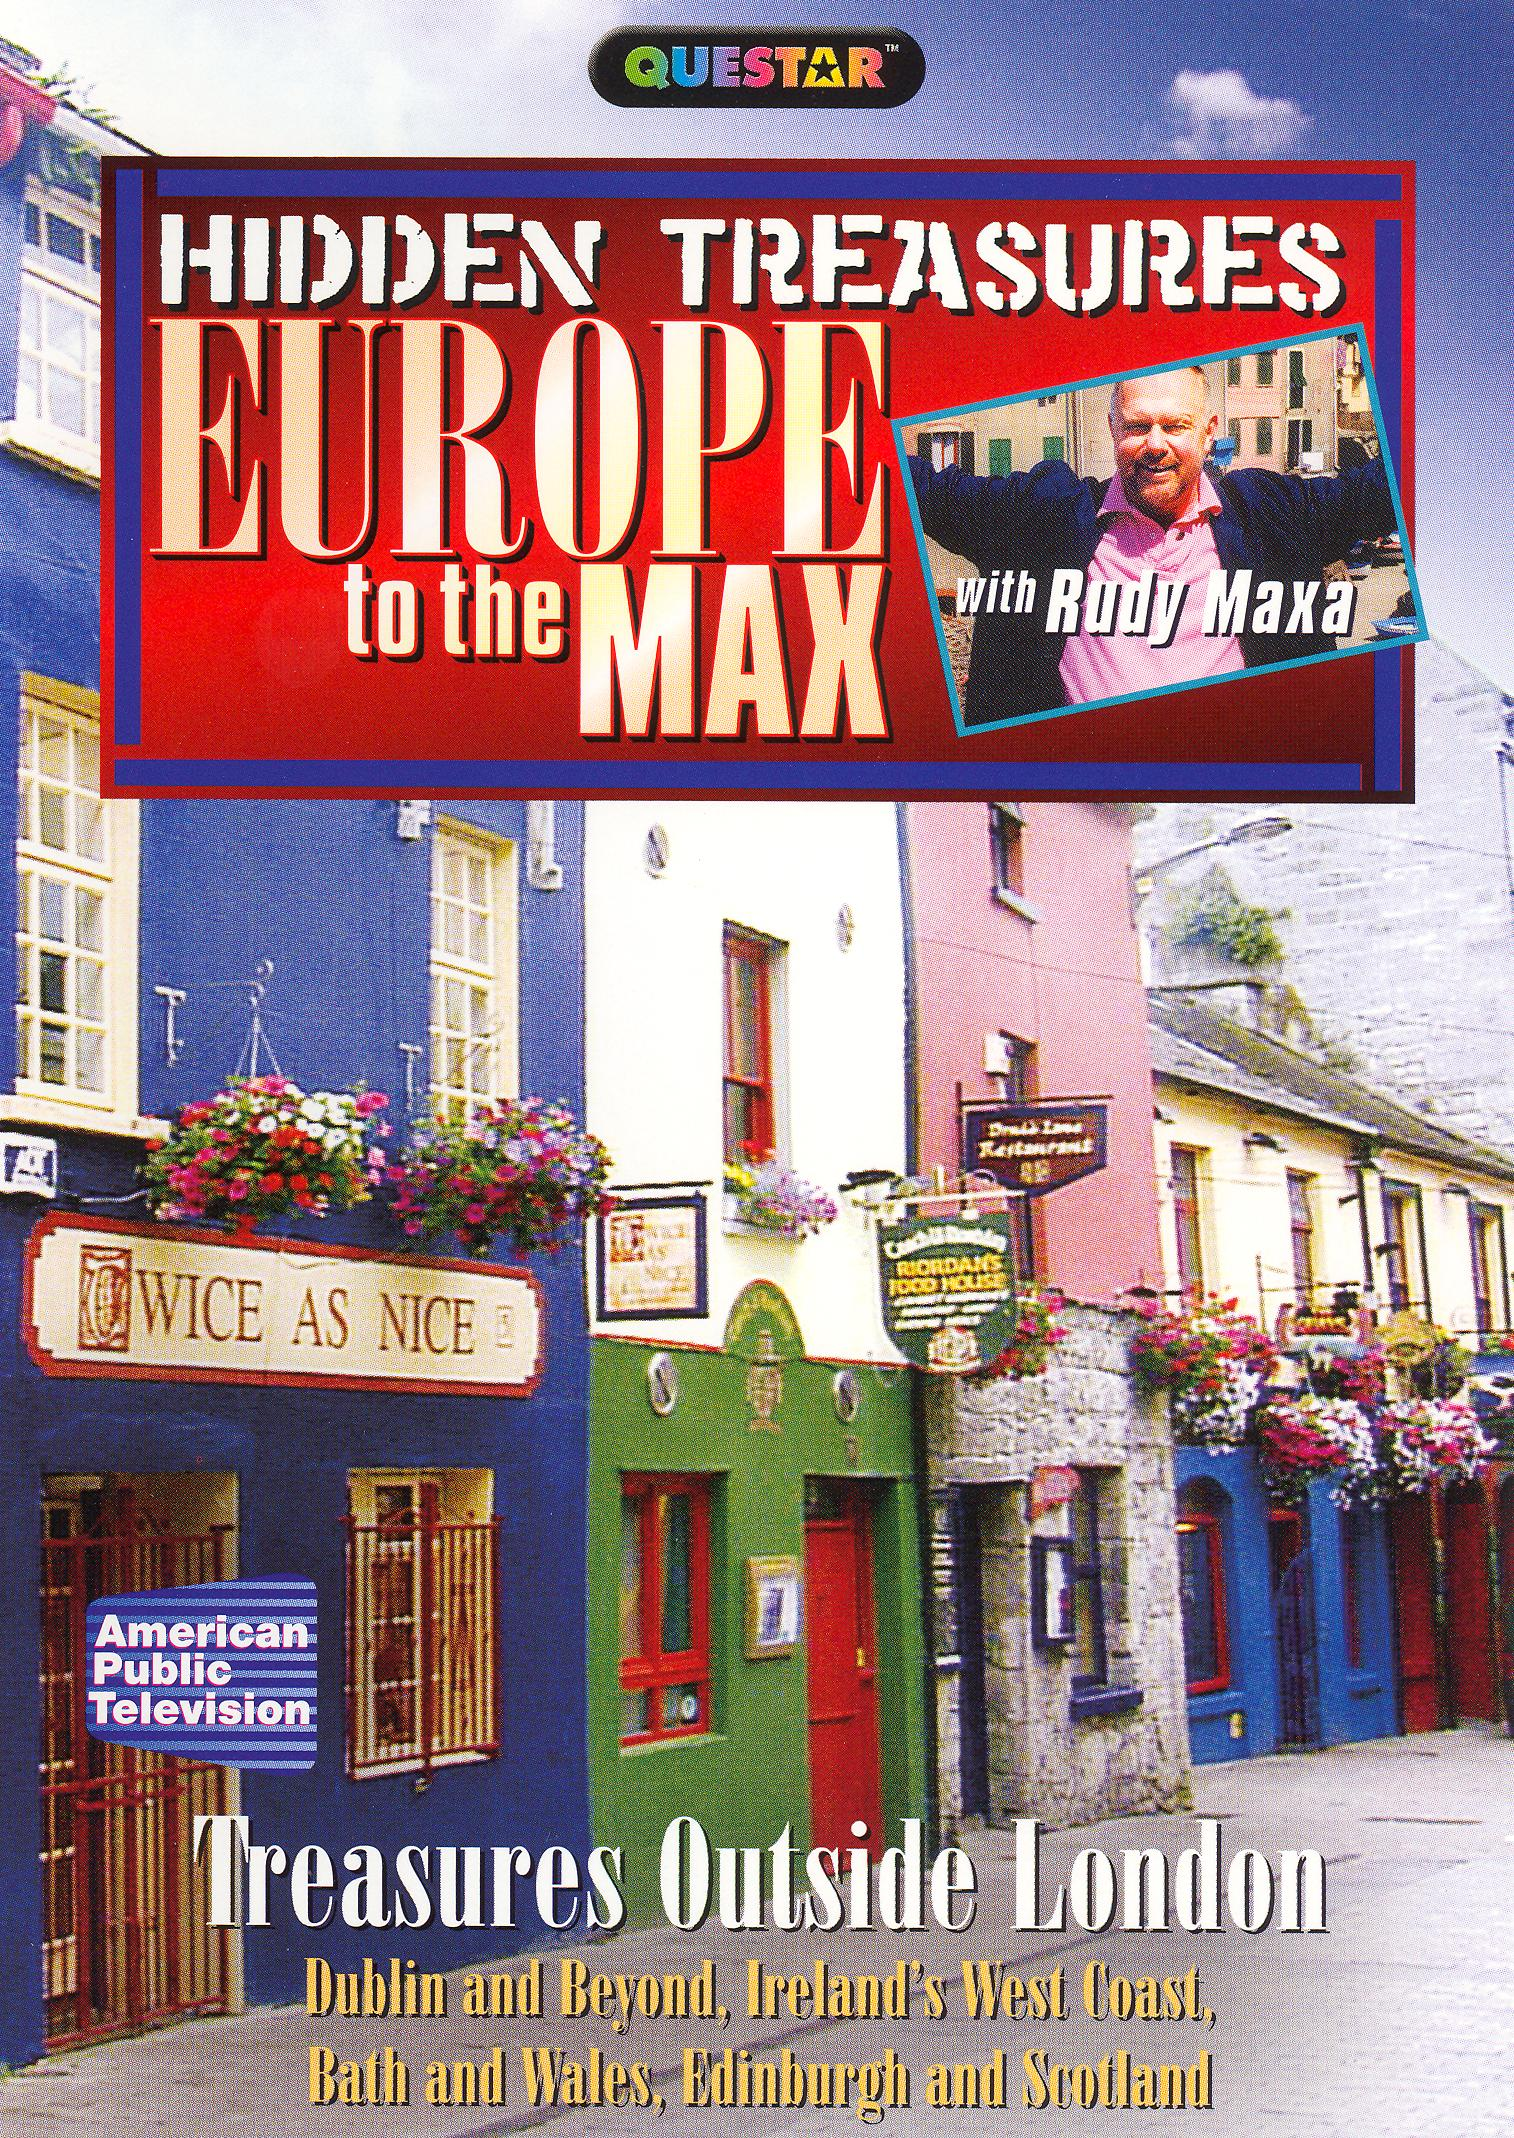 Rudy Maxa: Europe to the Max: Hidden Treasures - Treasures Outside London